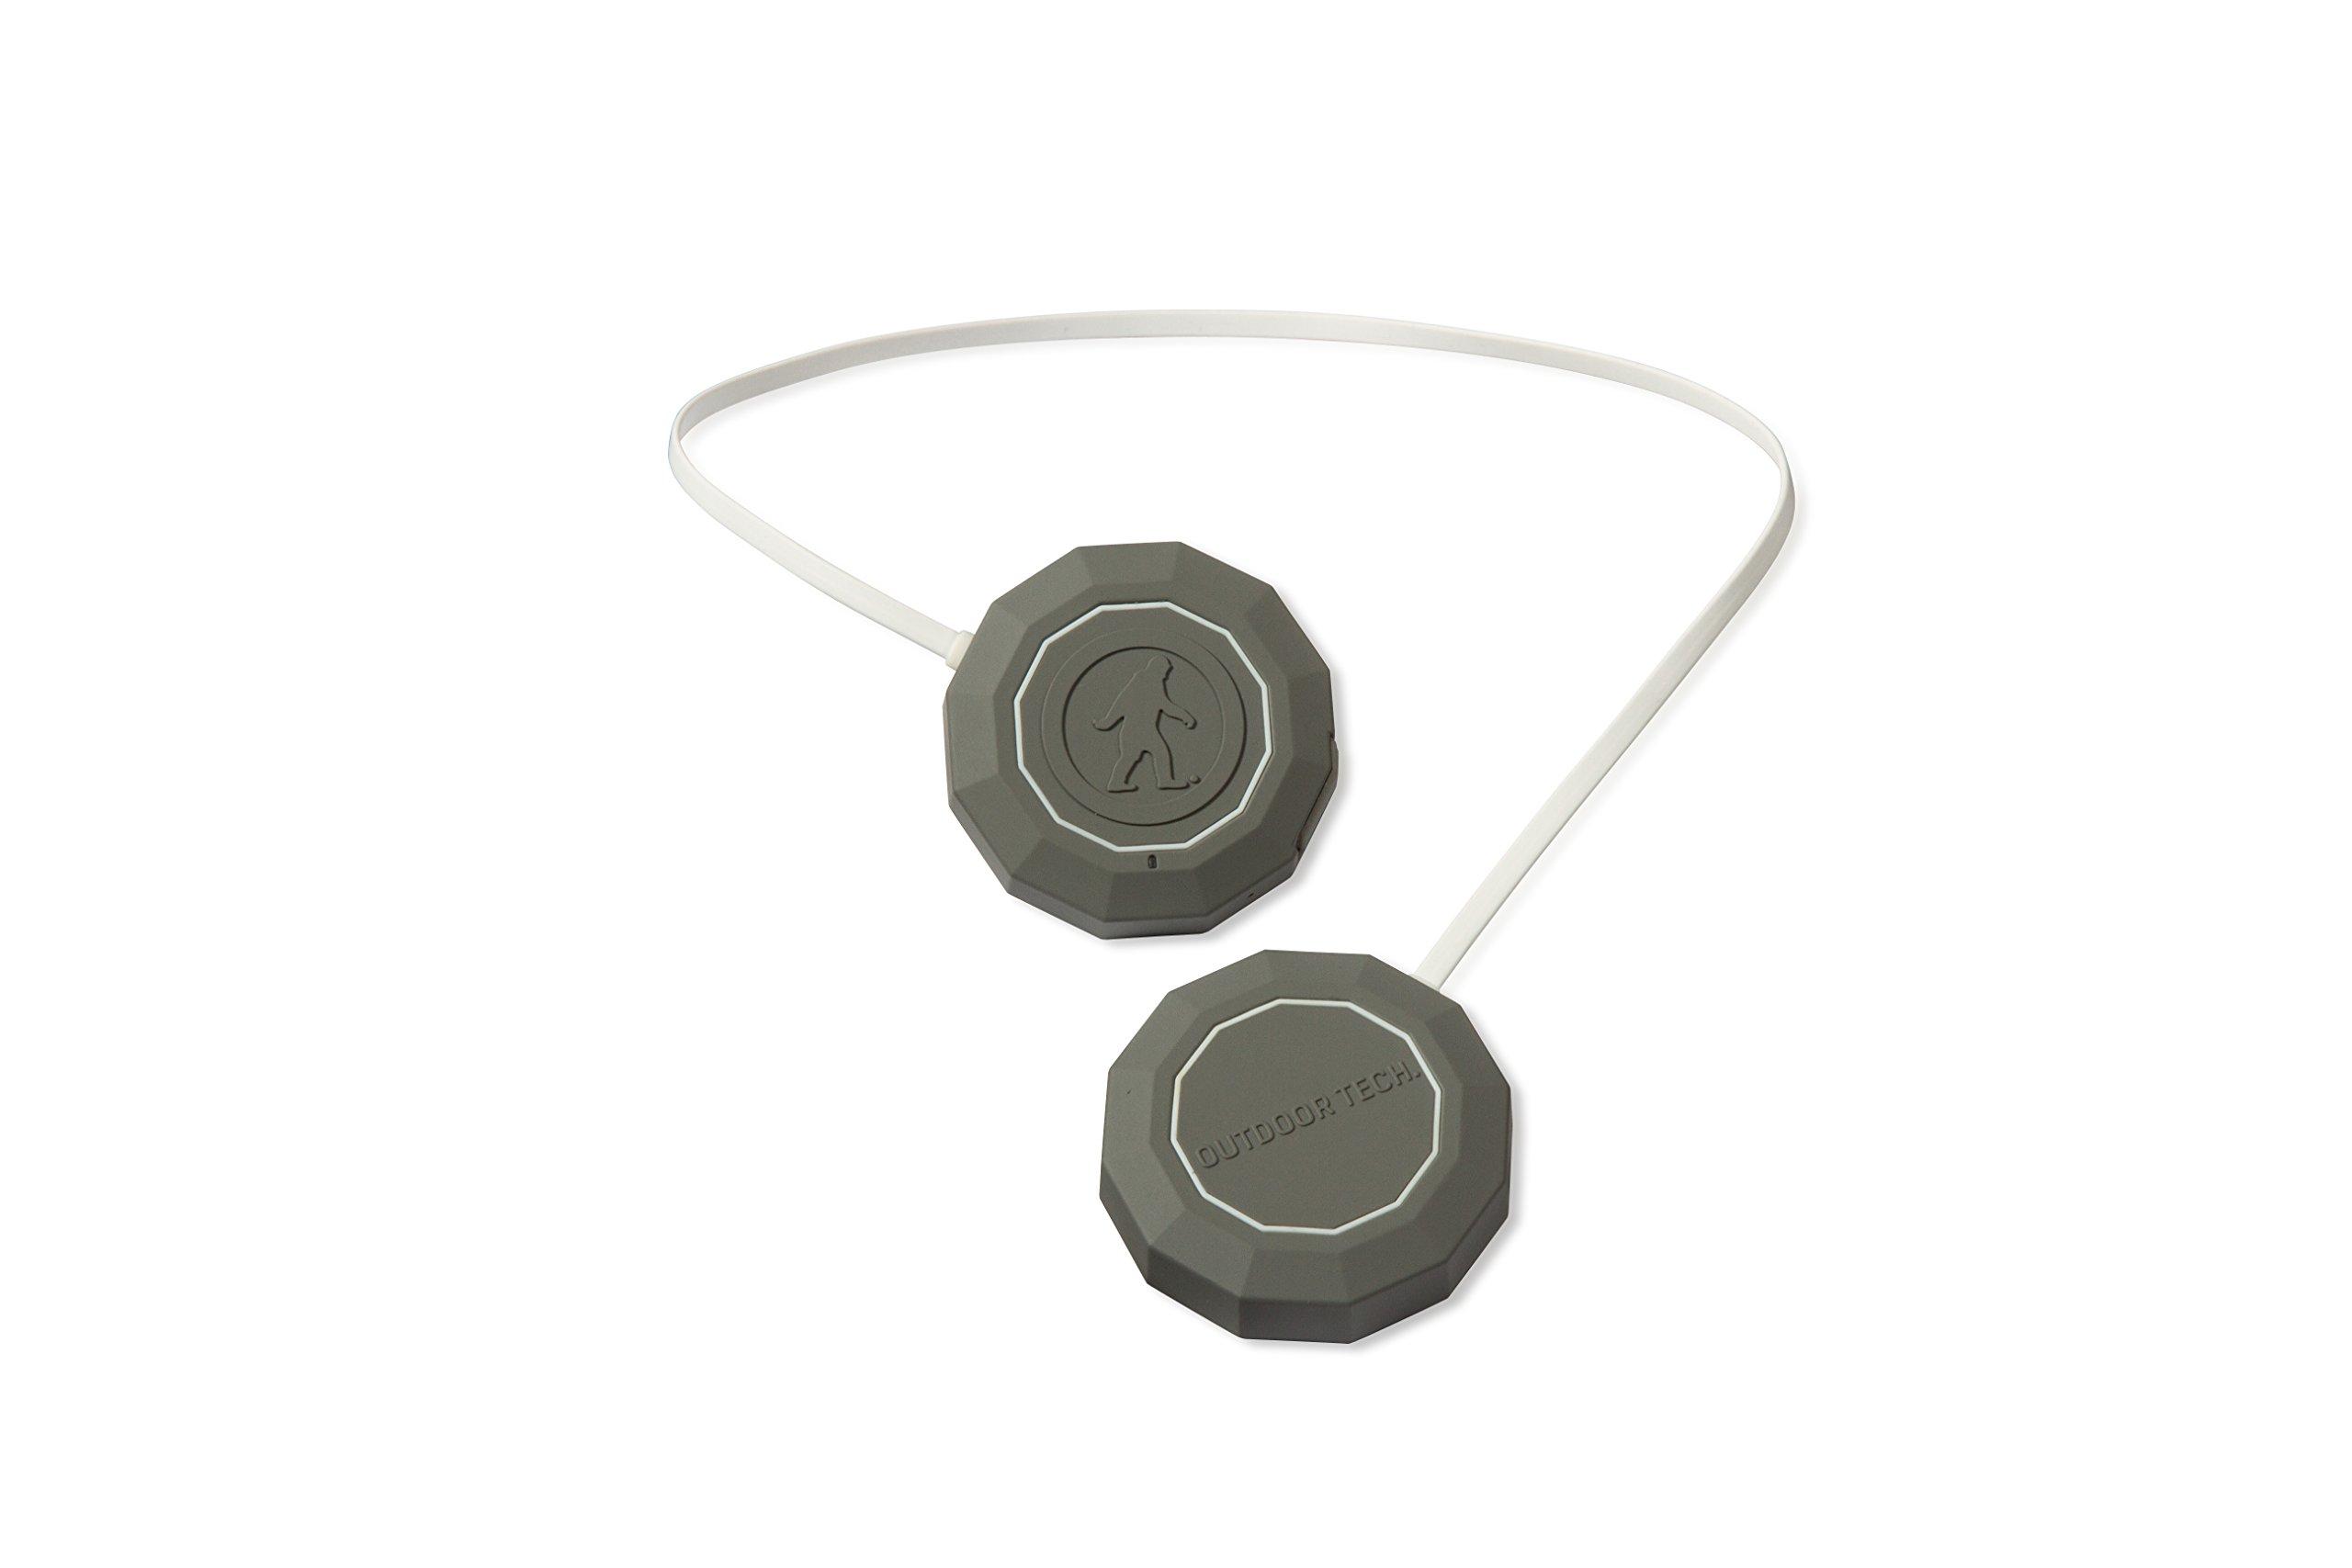 Outdoor Tech Chips 2.0 Universal Wireless Bluetooth Helmet Audio + Walkie-Talkie (OT0052) by Outdoor Technology